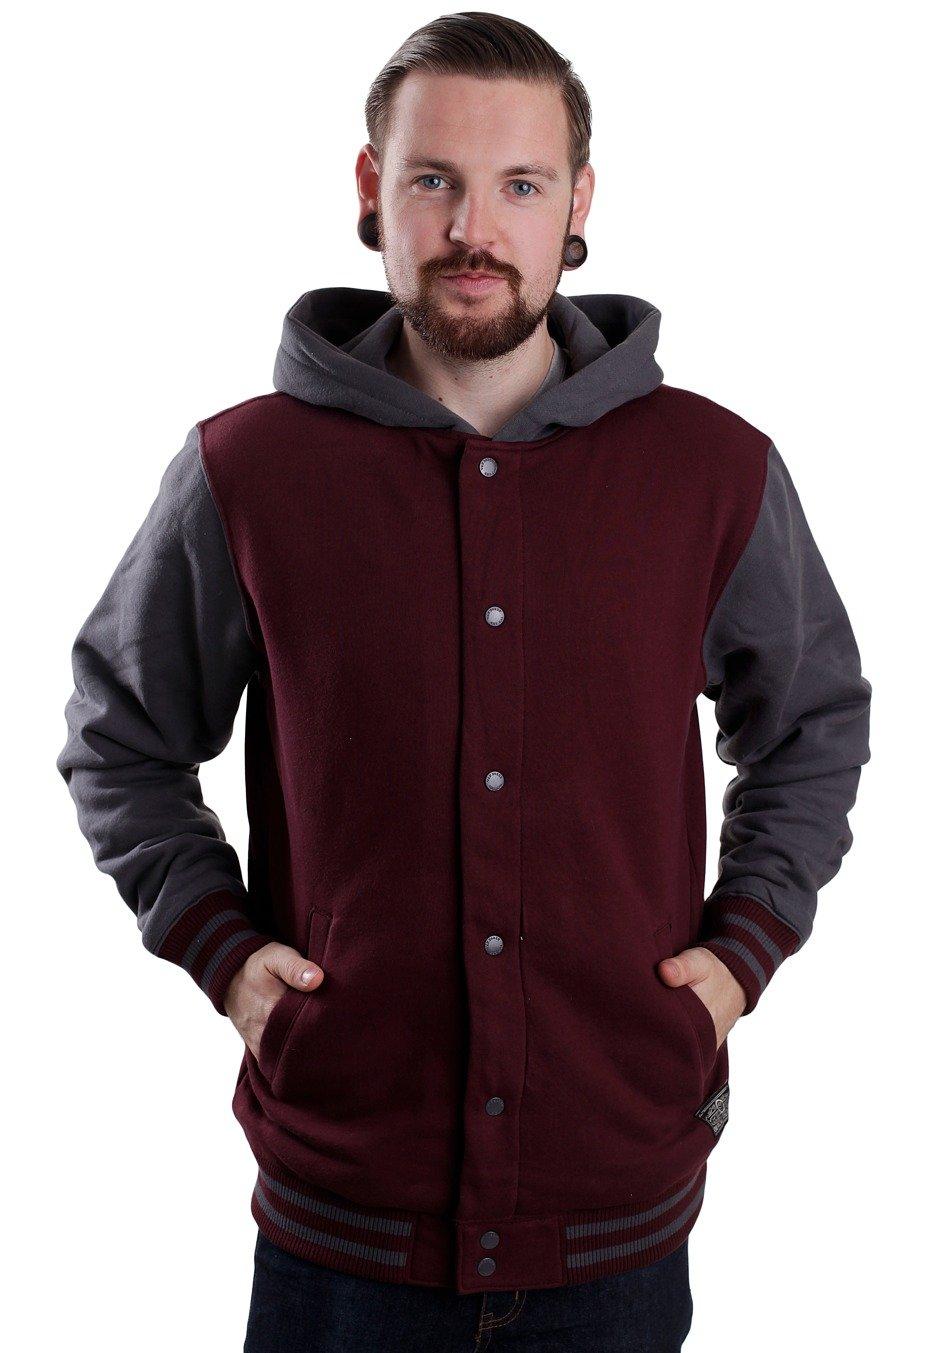 4e7f0b22cd Vans - University II Sherpa Port Royale Gravel - Hooded College Jacket -  Impericon.com UK